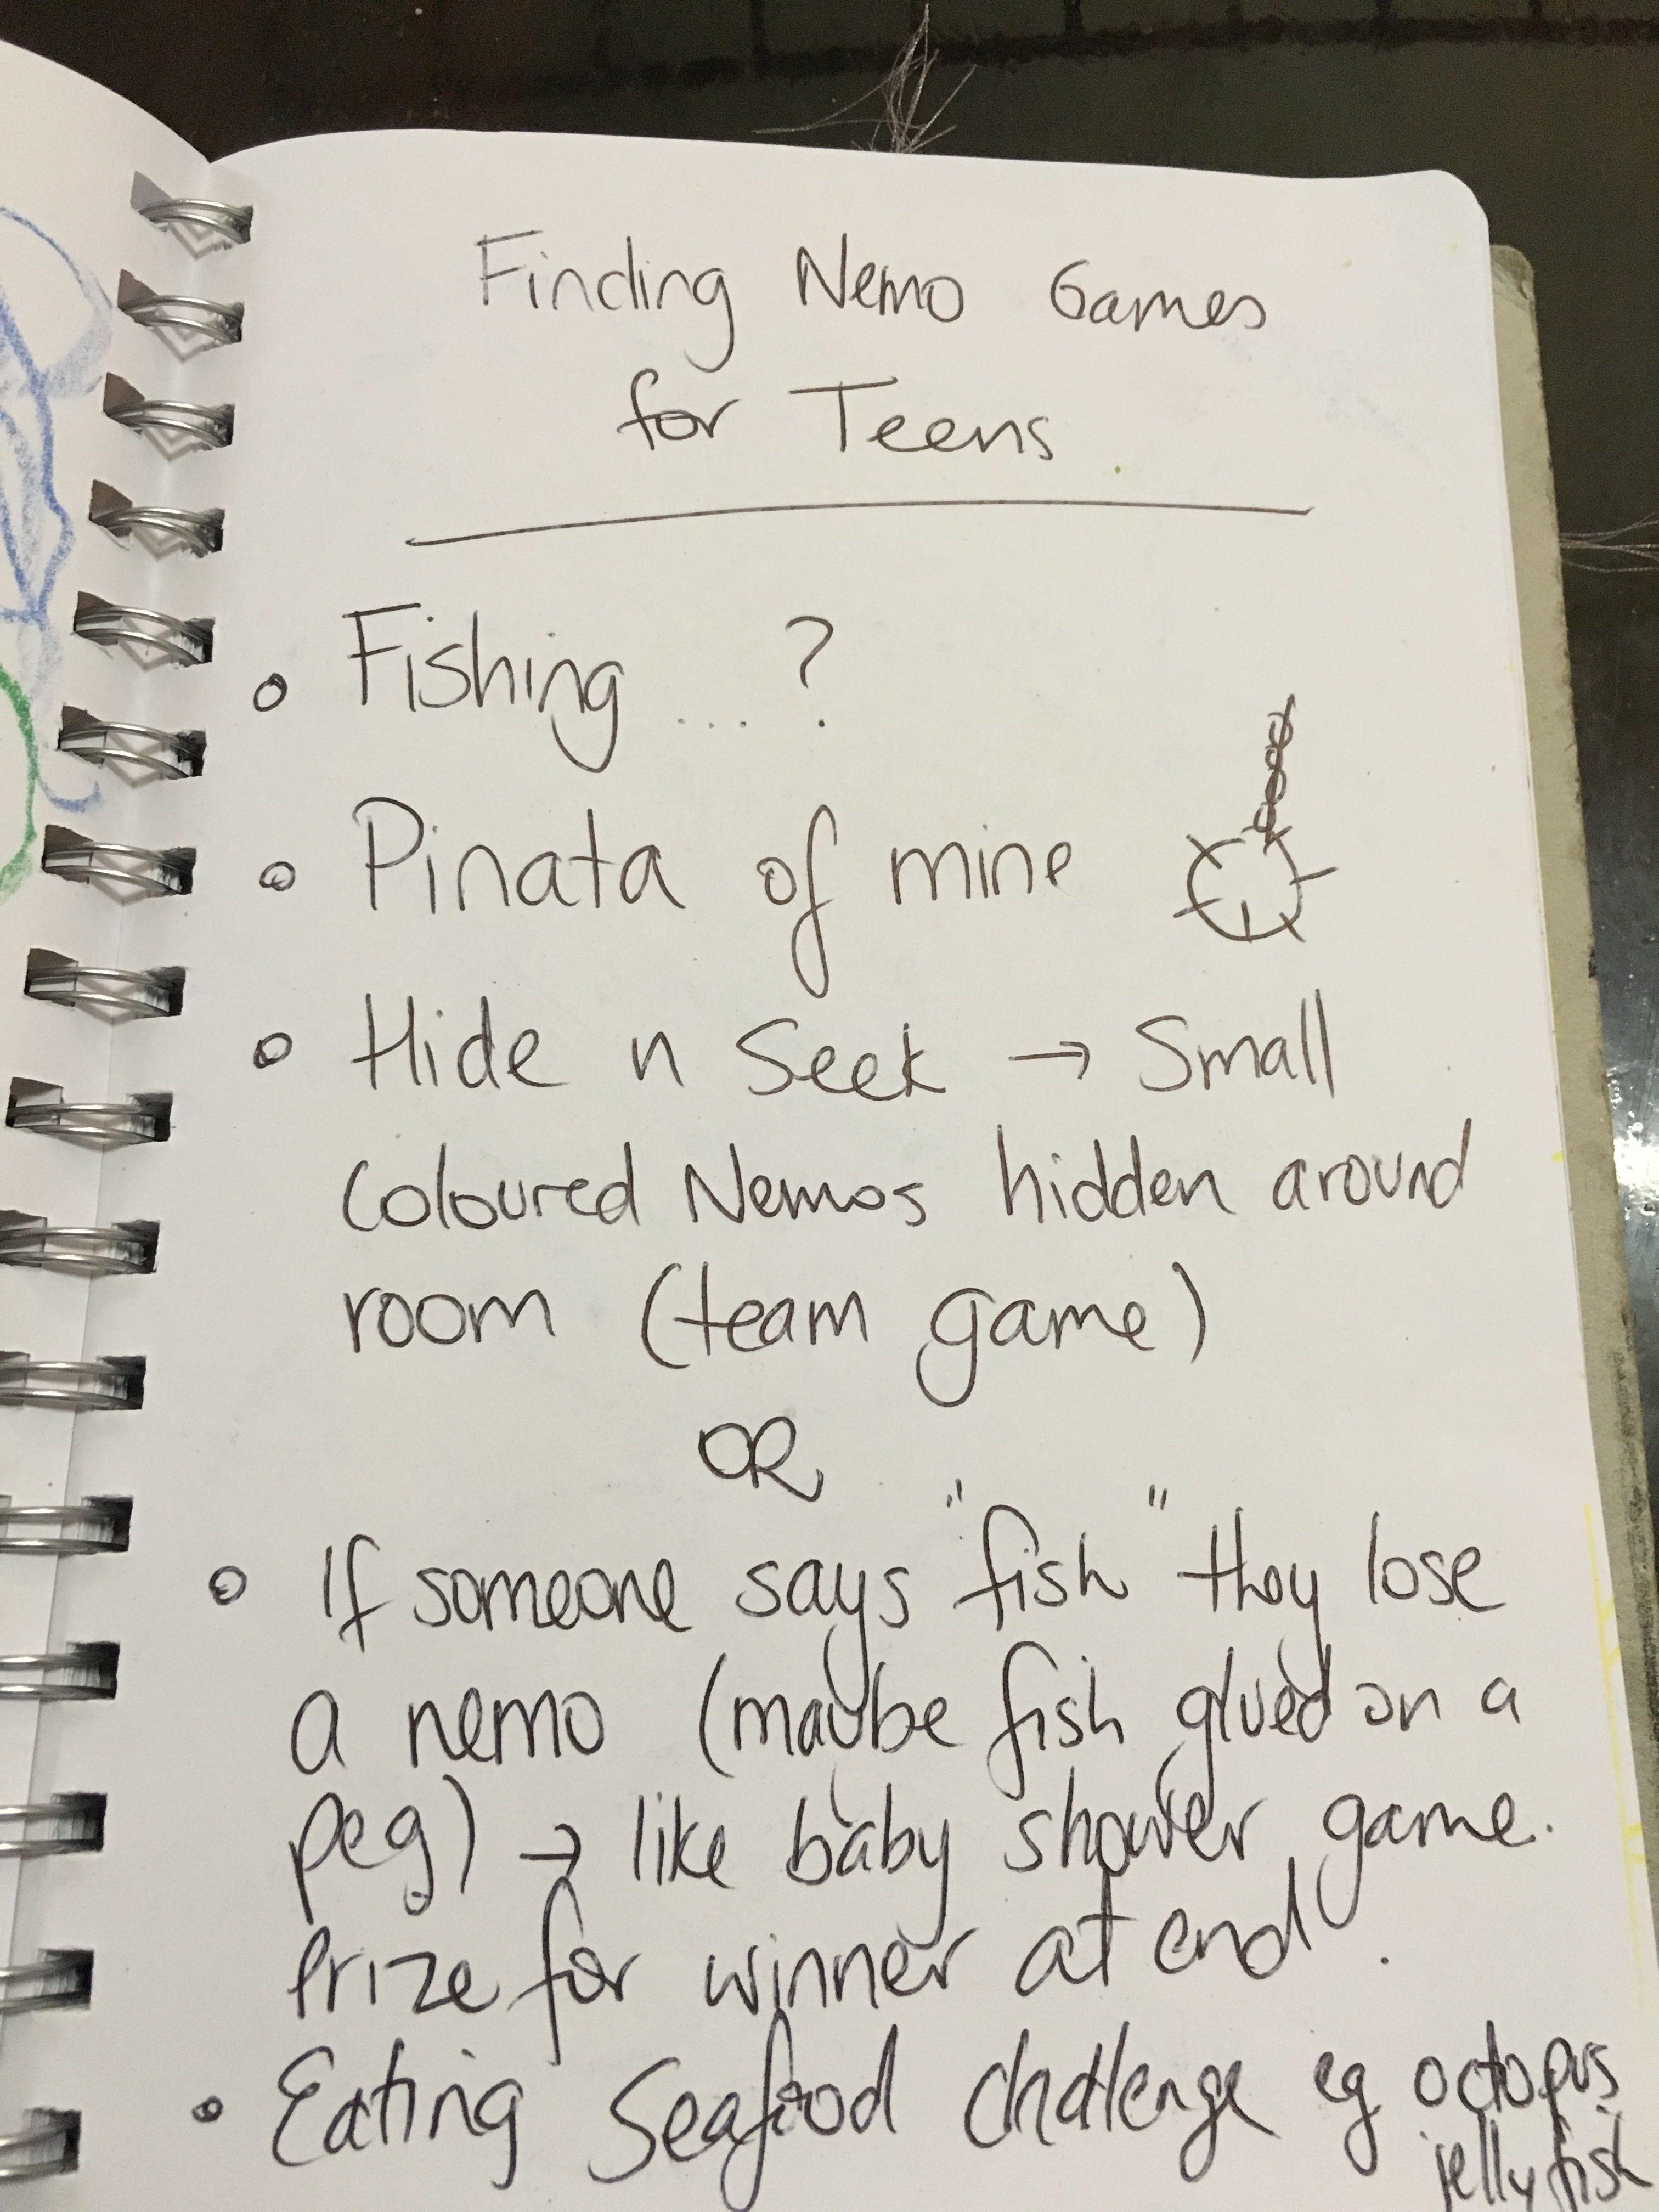 Games Finding Nemo